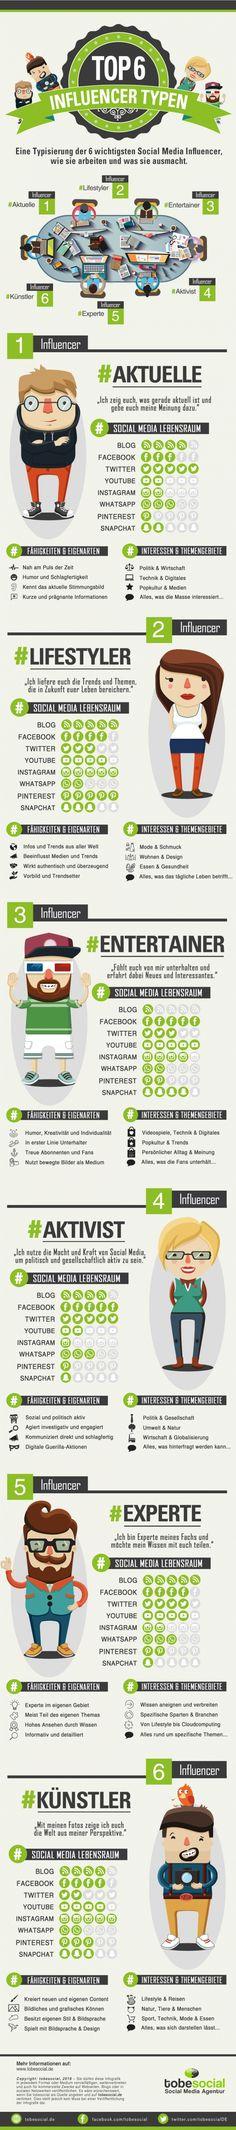 Top Social Media Influencer Typen Infografik: Agentur für Influencer Marketing und Empfehlungsmarketing via Social Media, auf Facebook, YouTube, Instagram, SnapChat, WhatsApp, Blogger Marketing, Blogger Relations. Social Media B2B und B2C, Agentur Word of Mouth Marketing  http://tobesocial.de/blog/infografik-influencer-marketing-social-media-agentur-youtube-facebook-instagram-empfehlungsmarketing